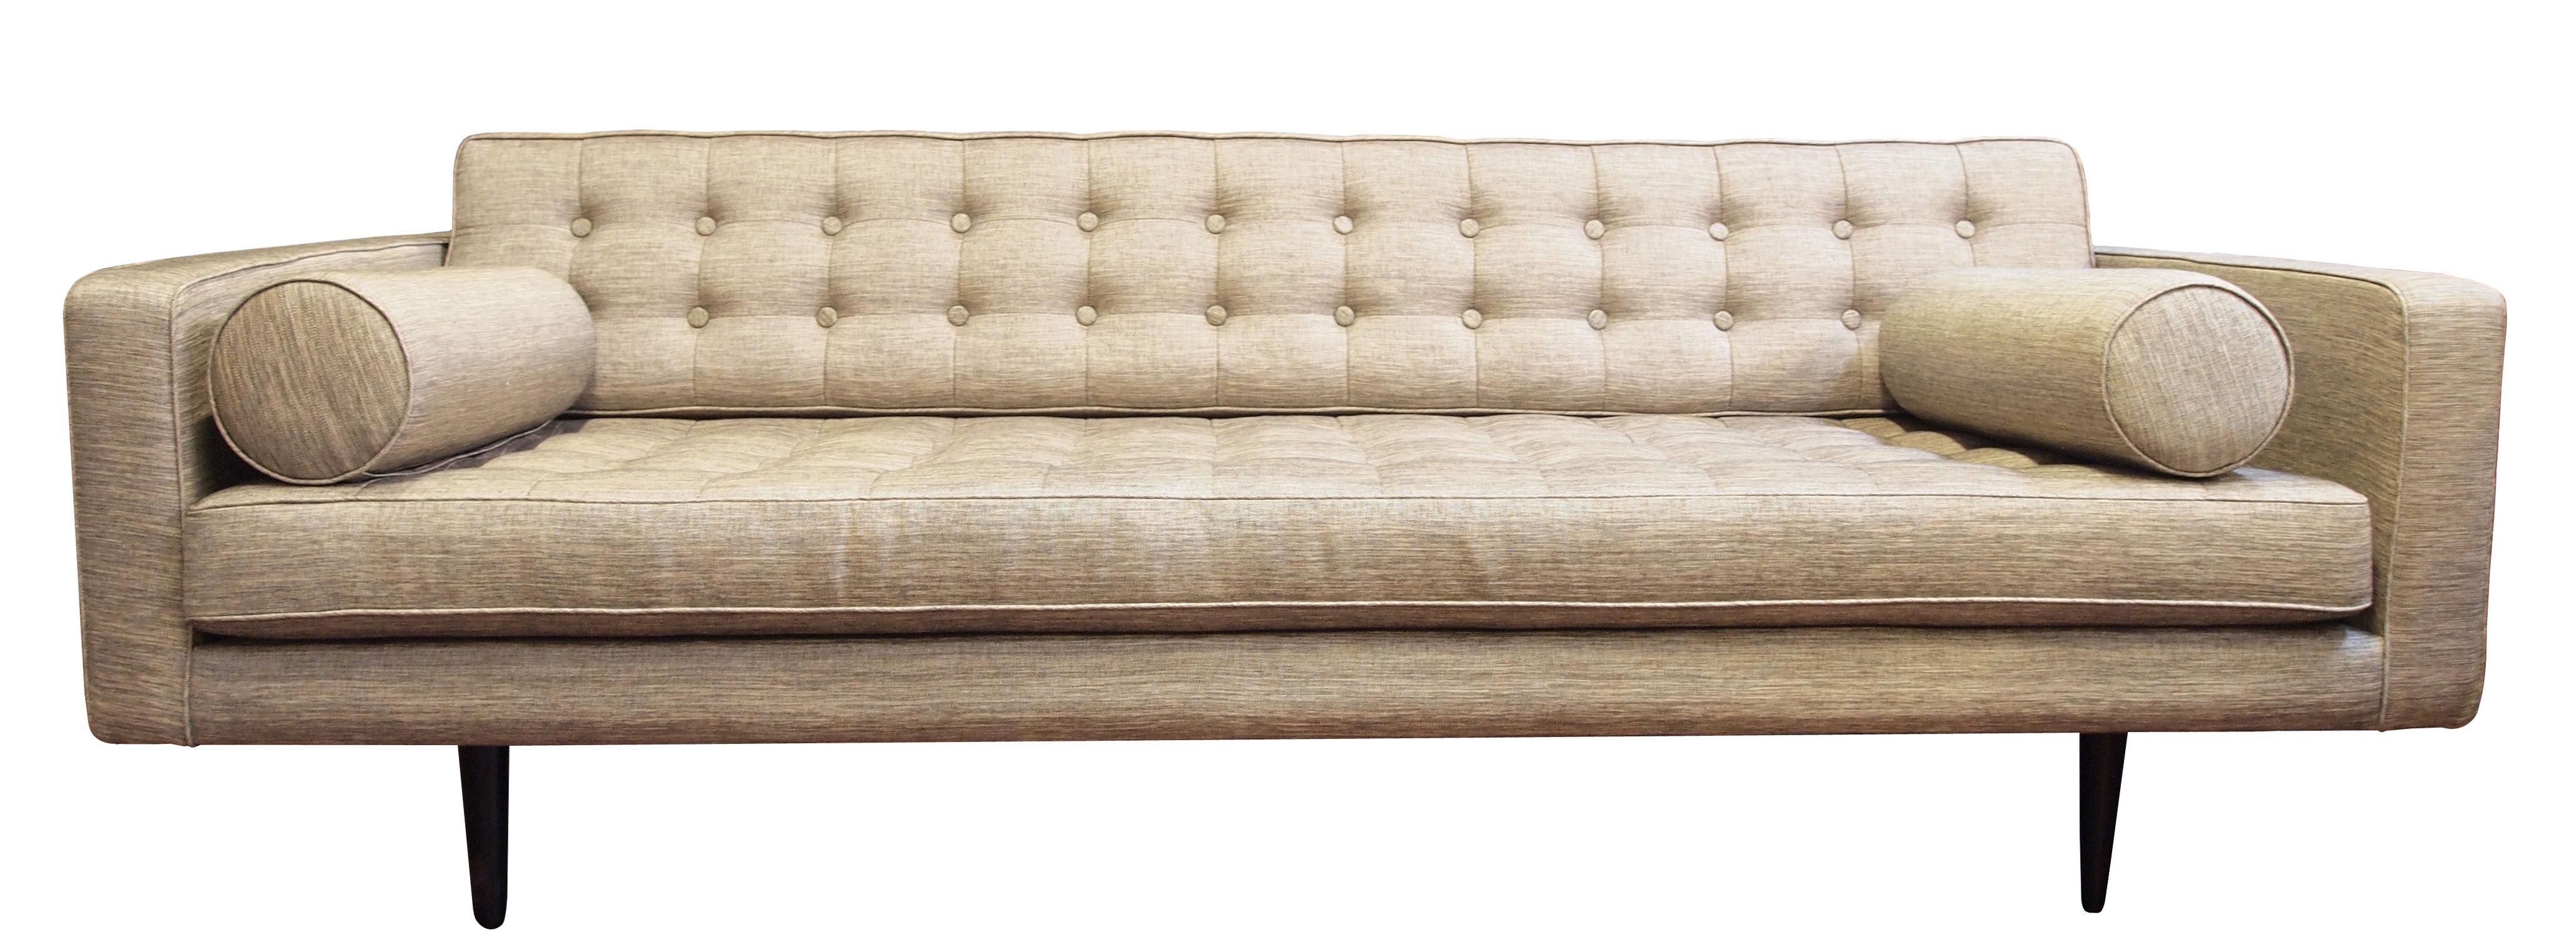 canap droit 3 places l 215 cm beige argent made in design editions. Black Bedroom Furniture Sets. Home Design Ideas